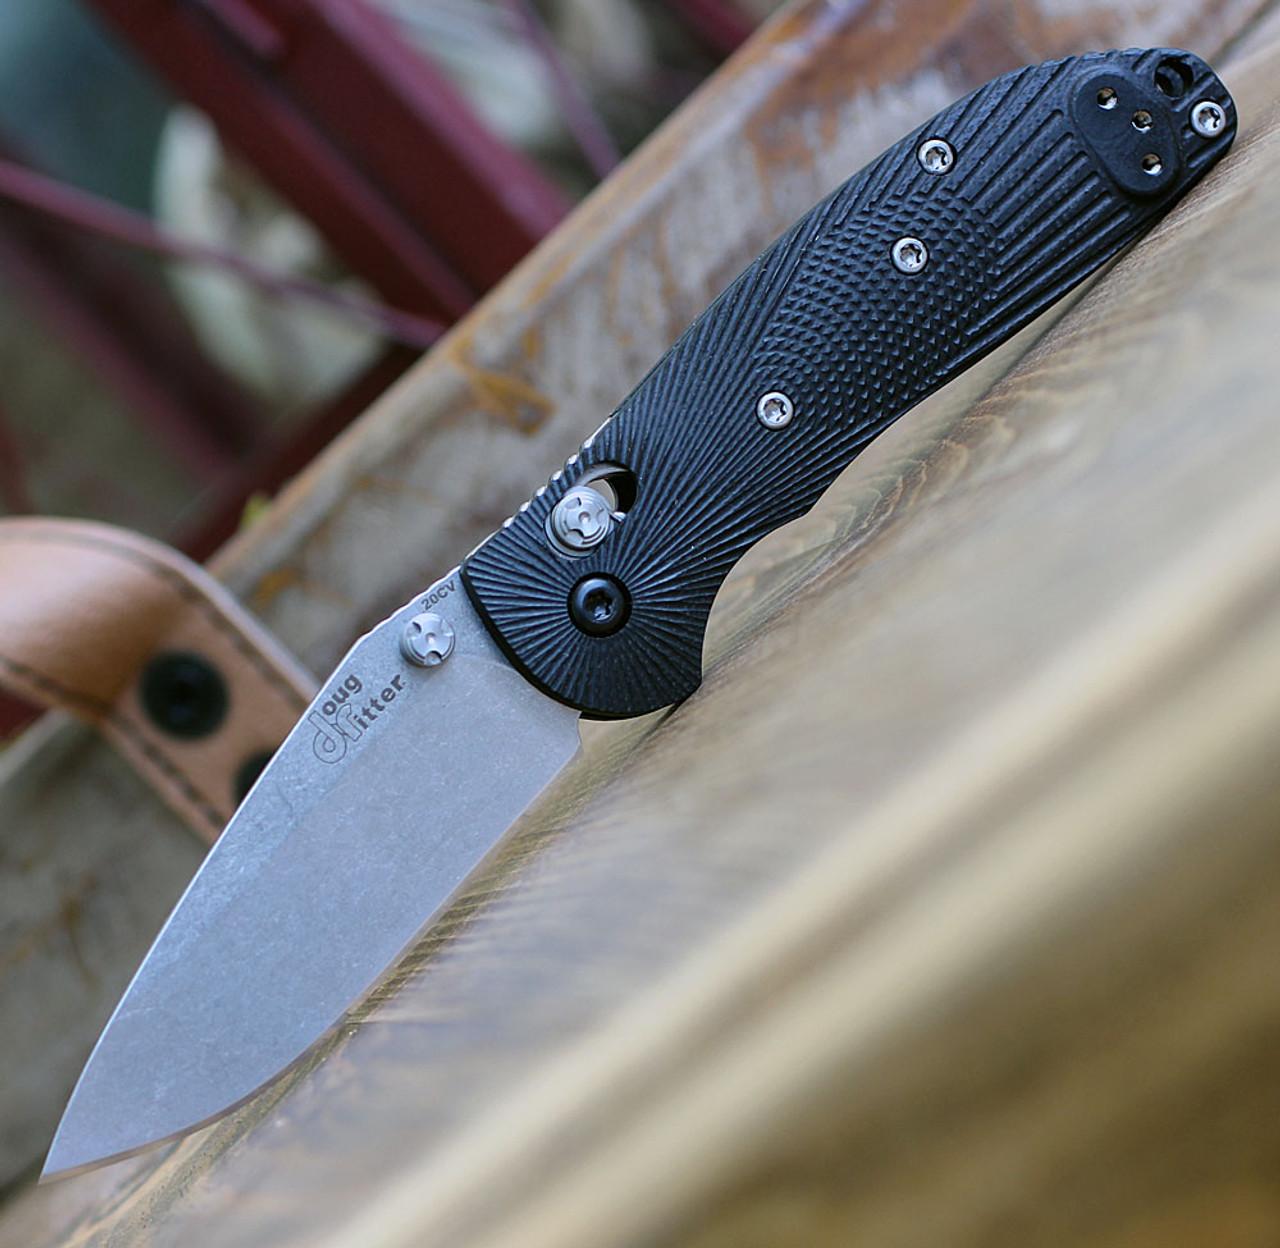 Doug Ritter Mini-RSK®  MK1-G2 Knifeworks Exclusive - Black / Stonewashed